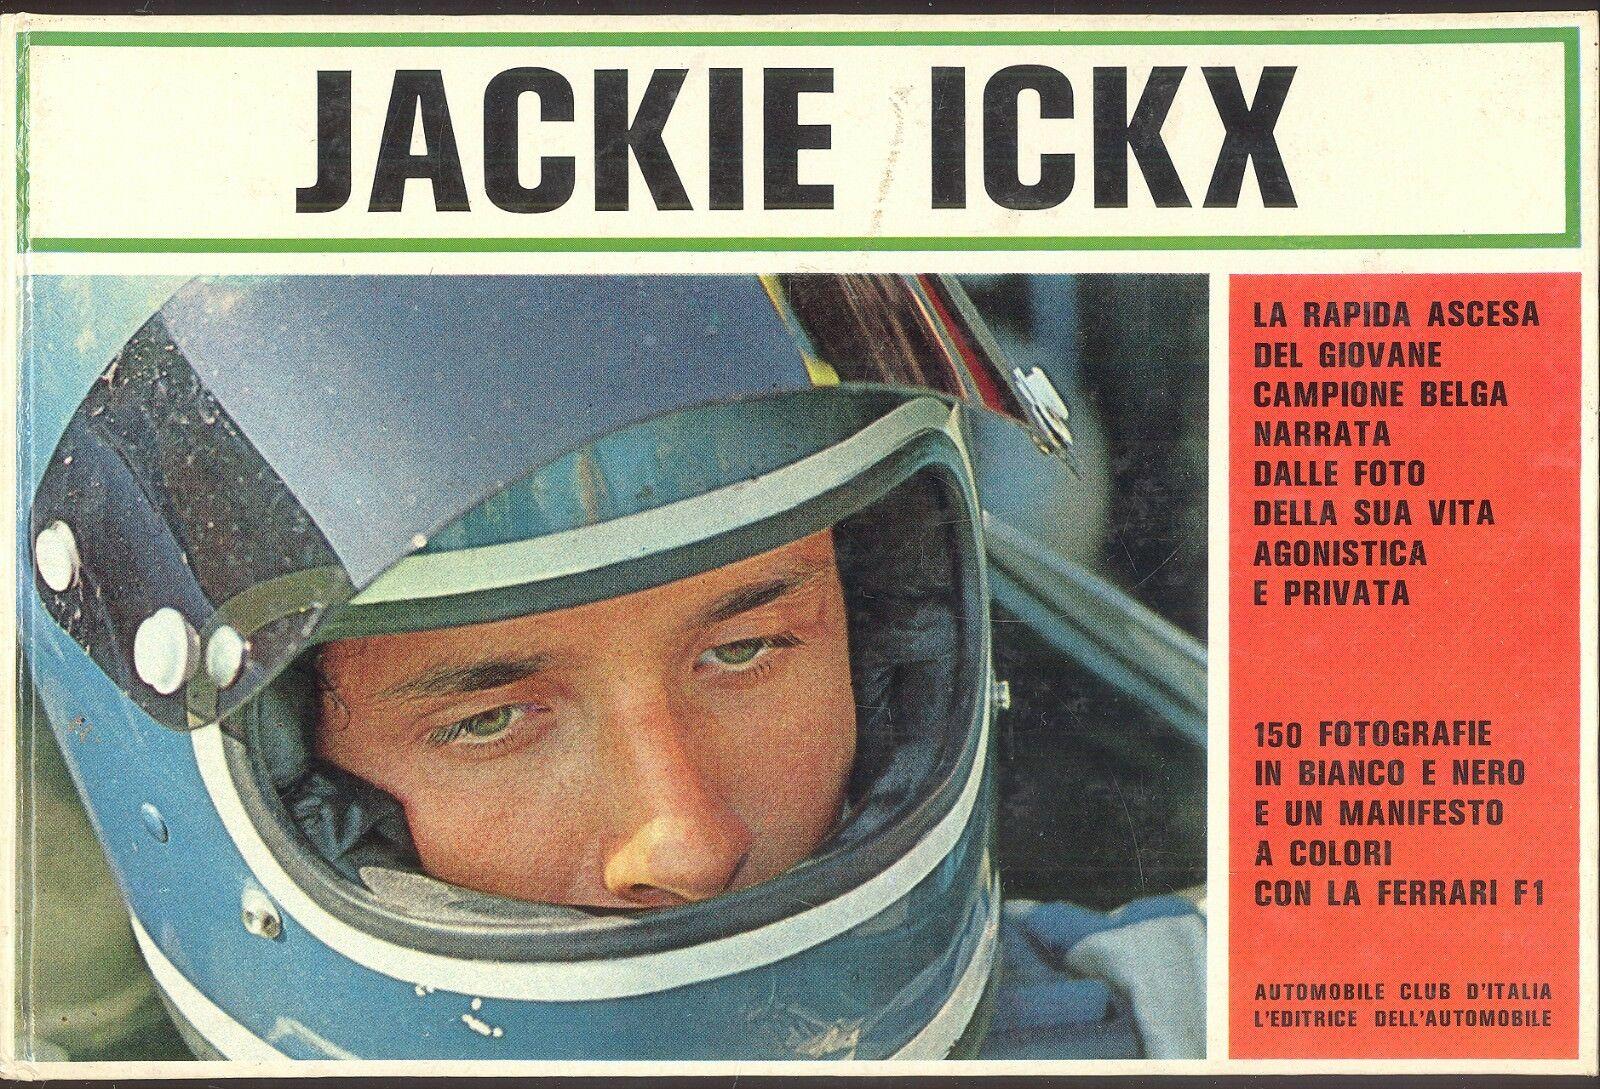 """Jackie Ickx"" di Nestola & Tommasi (L'editrice dell'automobile, 1970)"